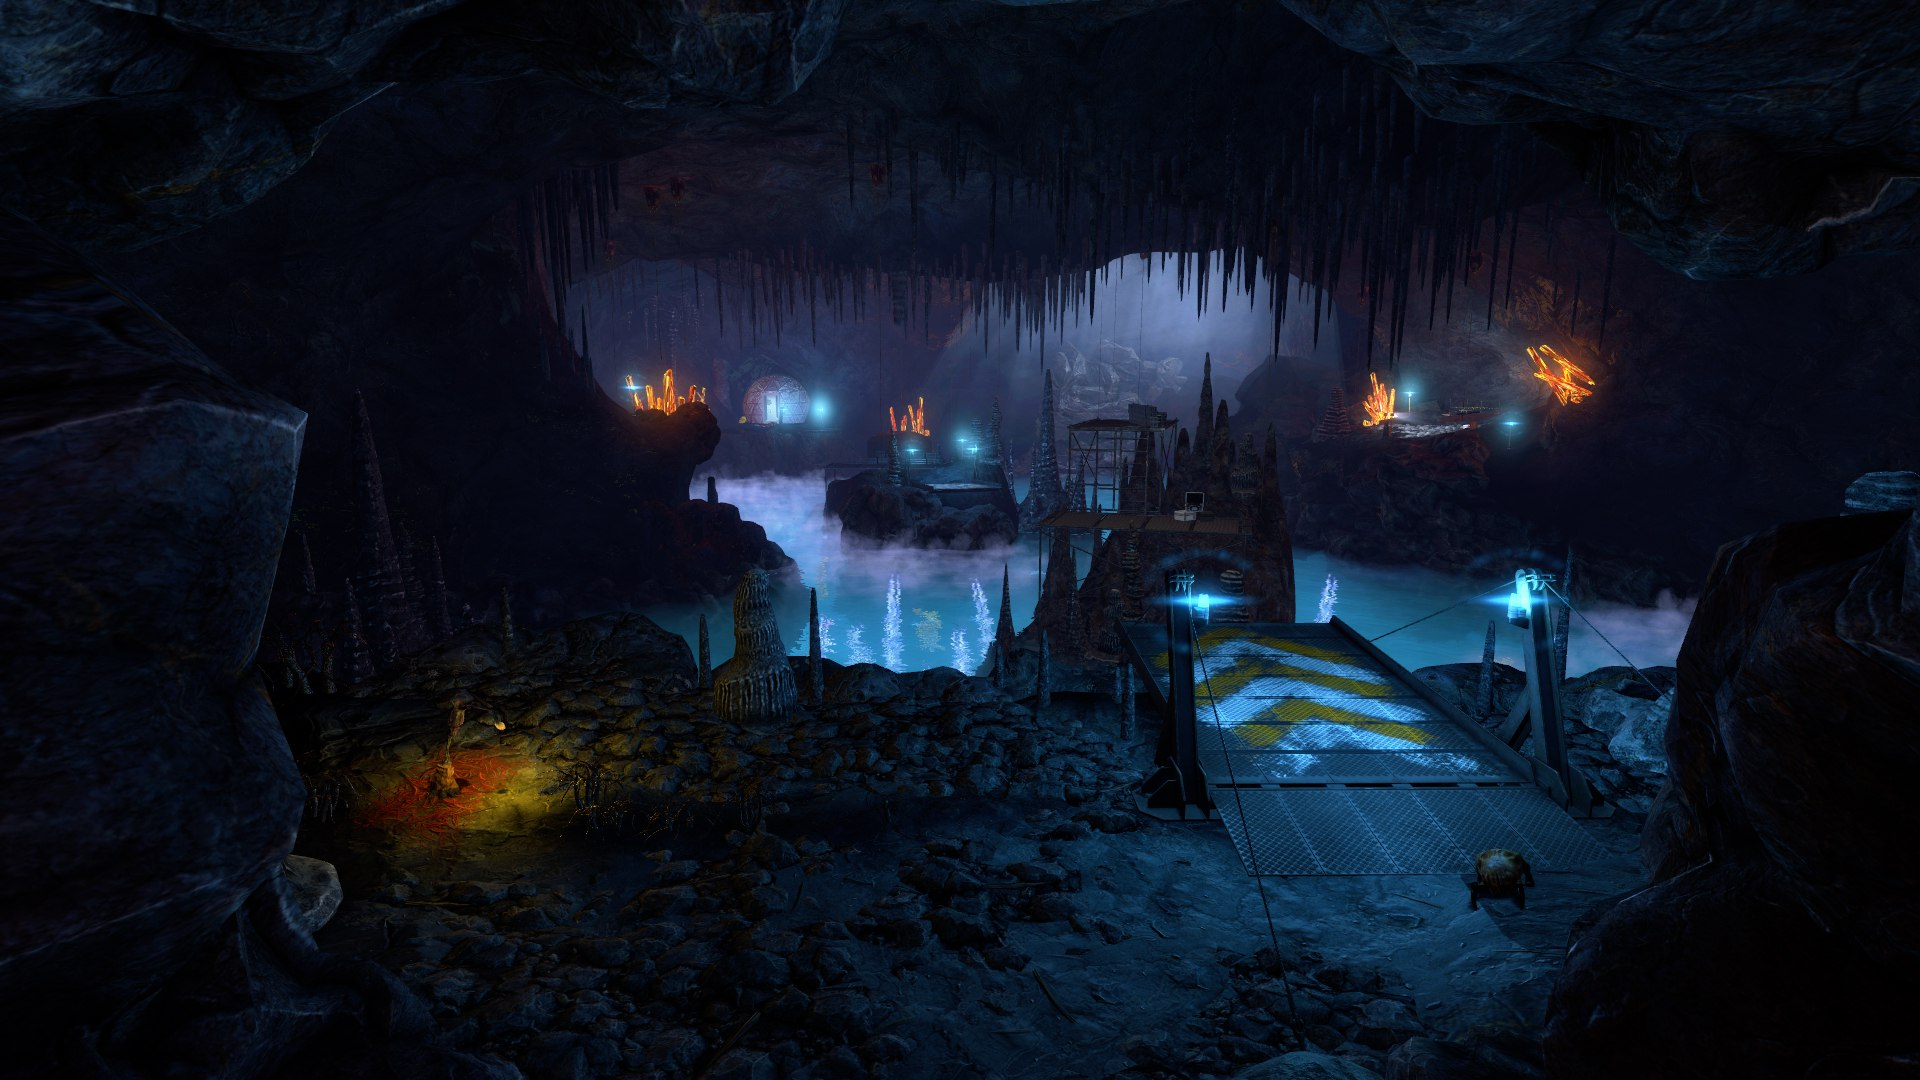 xen screenshot - Half-Life